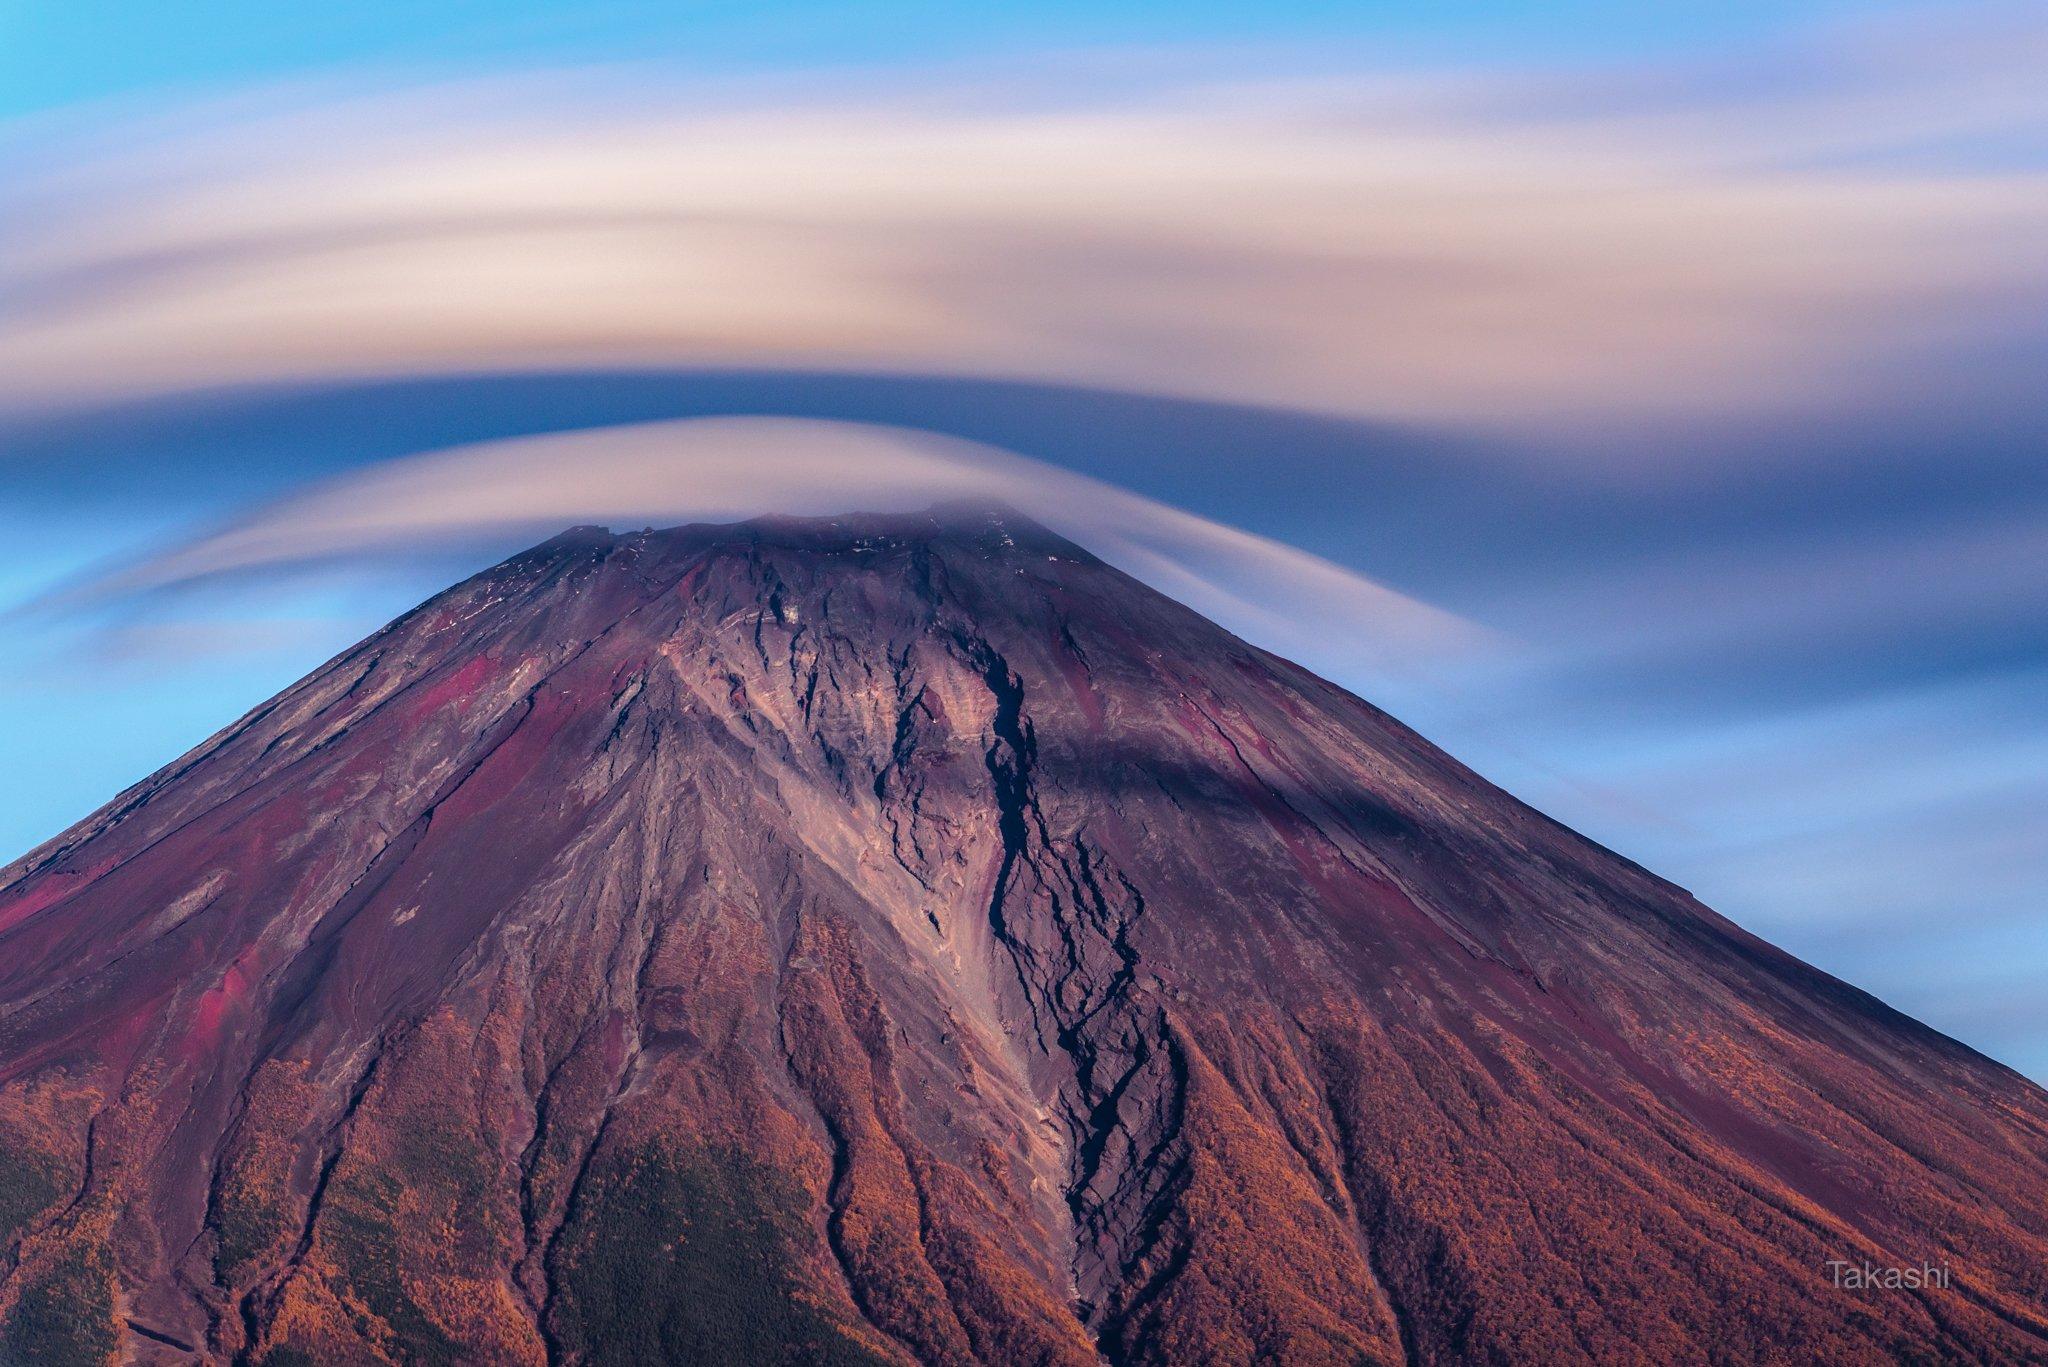 Fuji,Japan,mountain,clouds,sky,red,blue,, Takashi